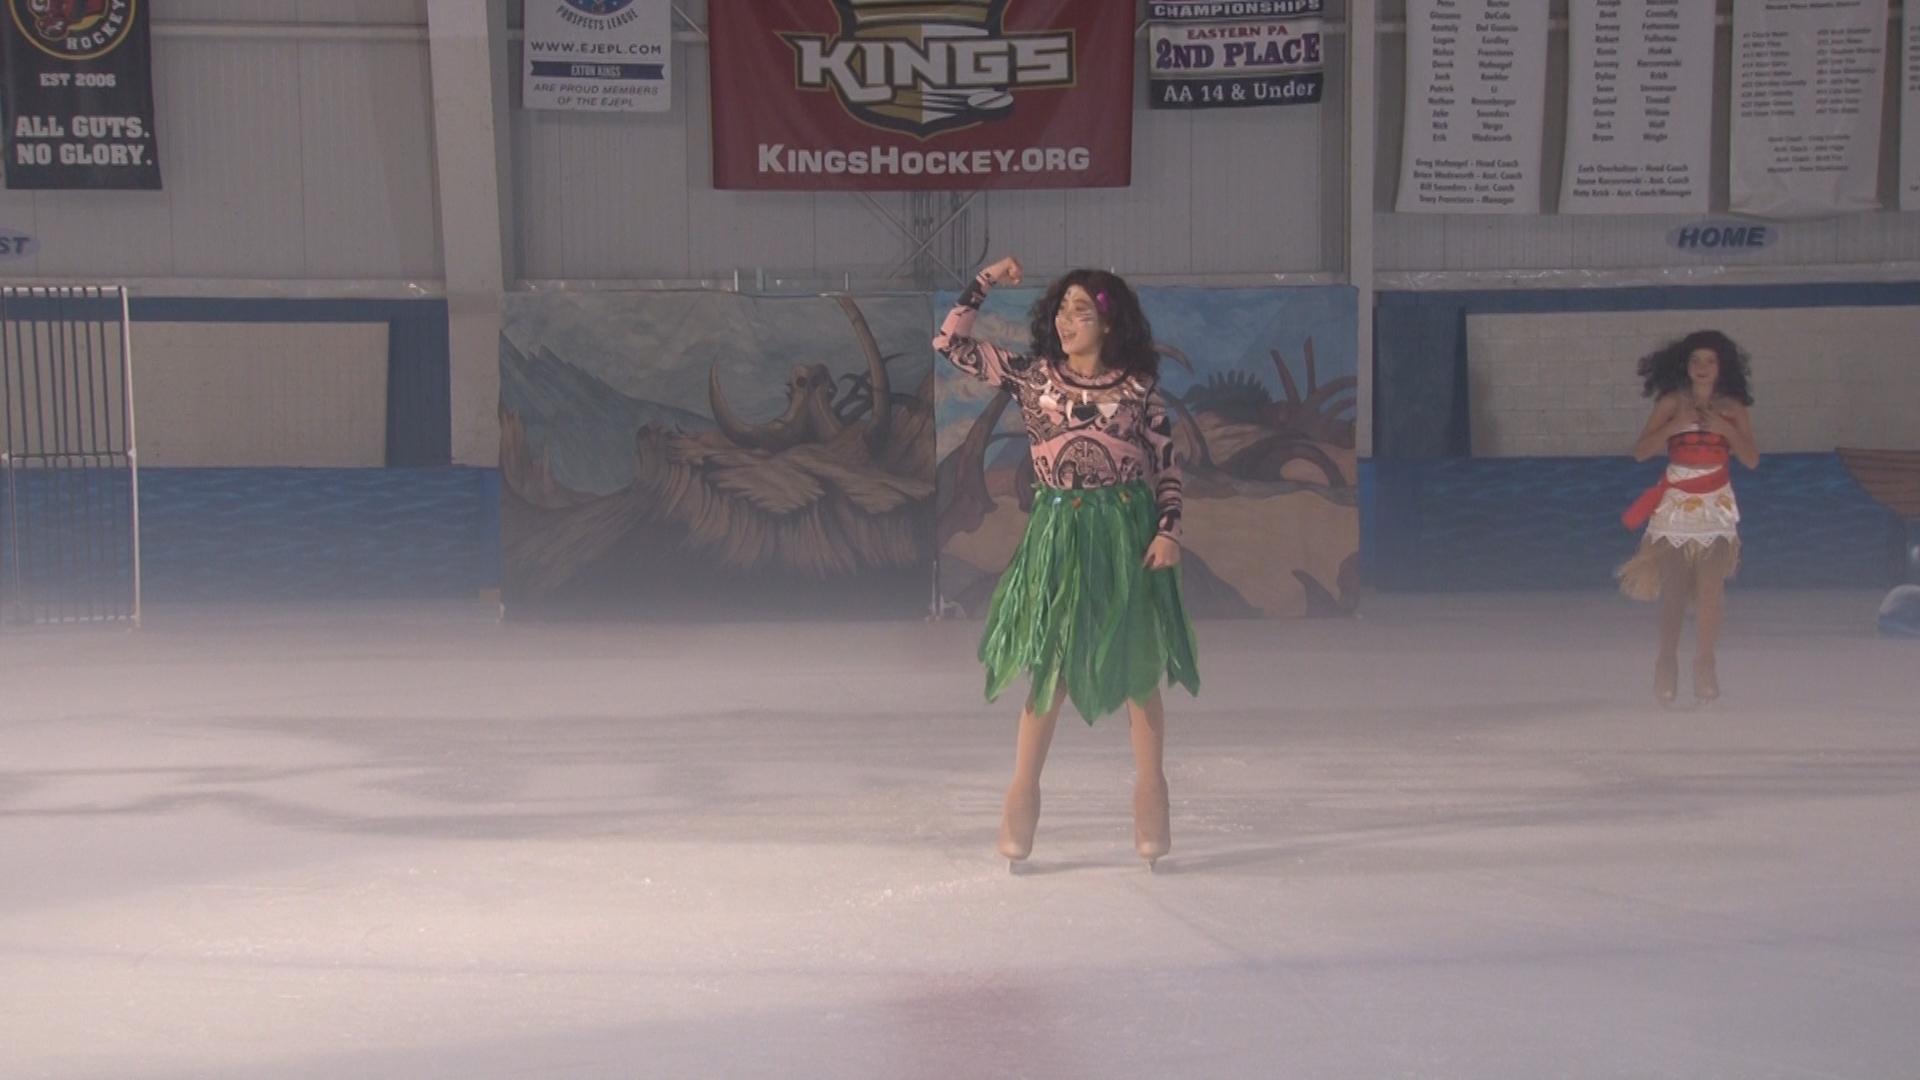 Power Play Maui Skate on Ice 071417.00_31_18_05.Still047.jpg